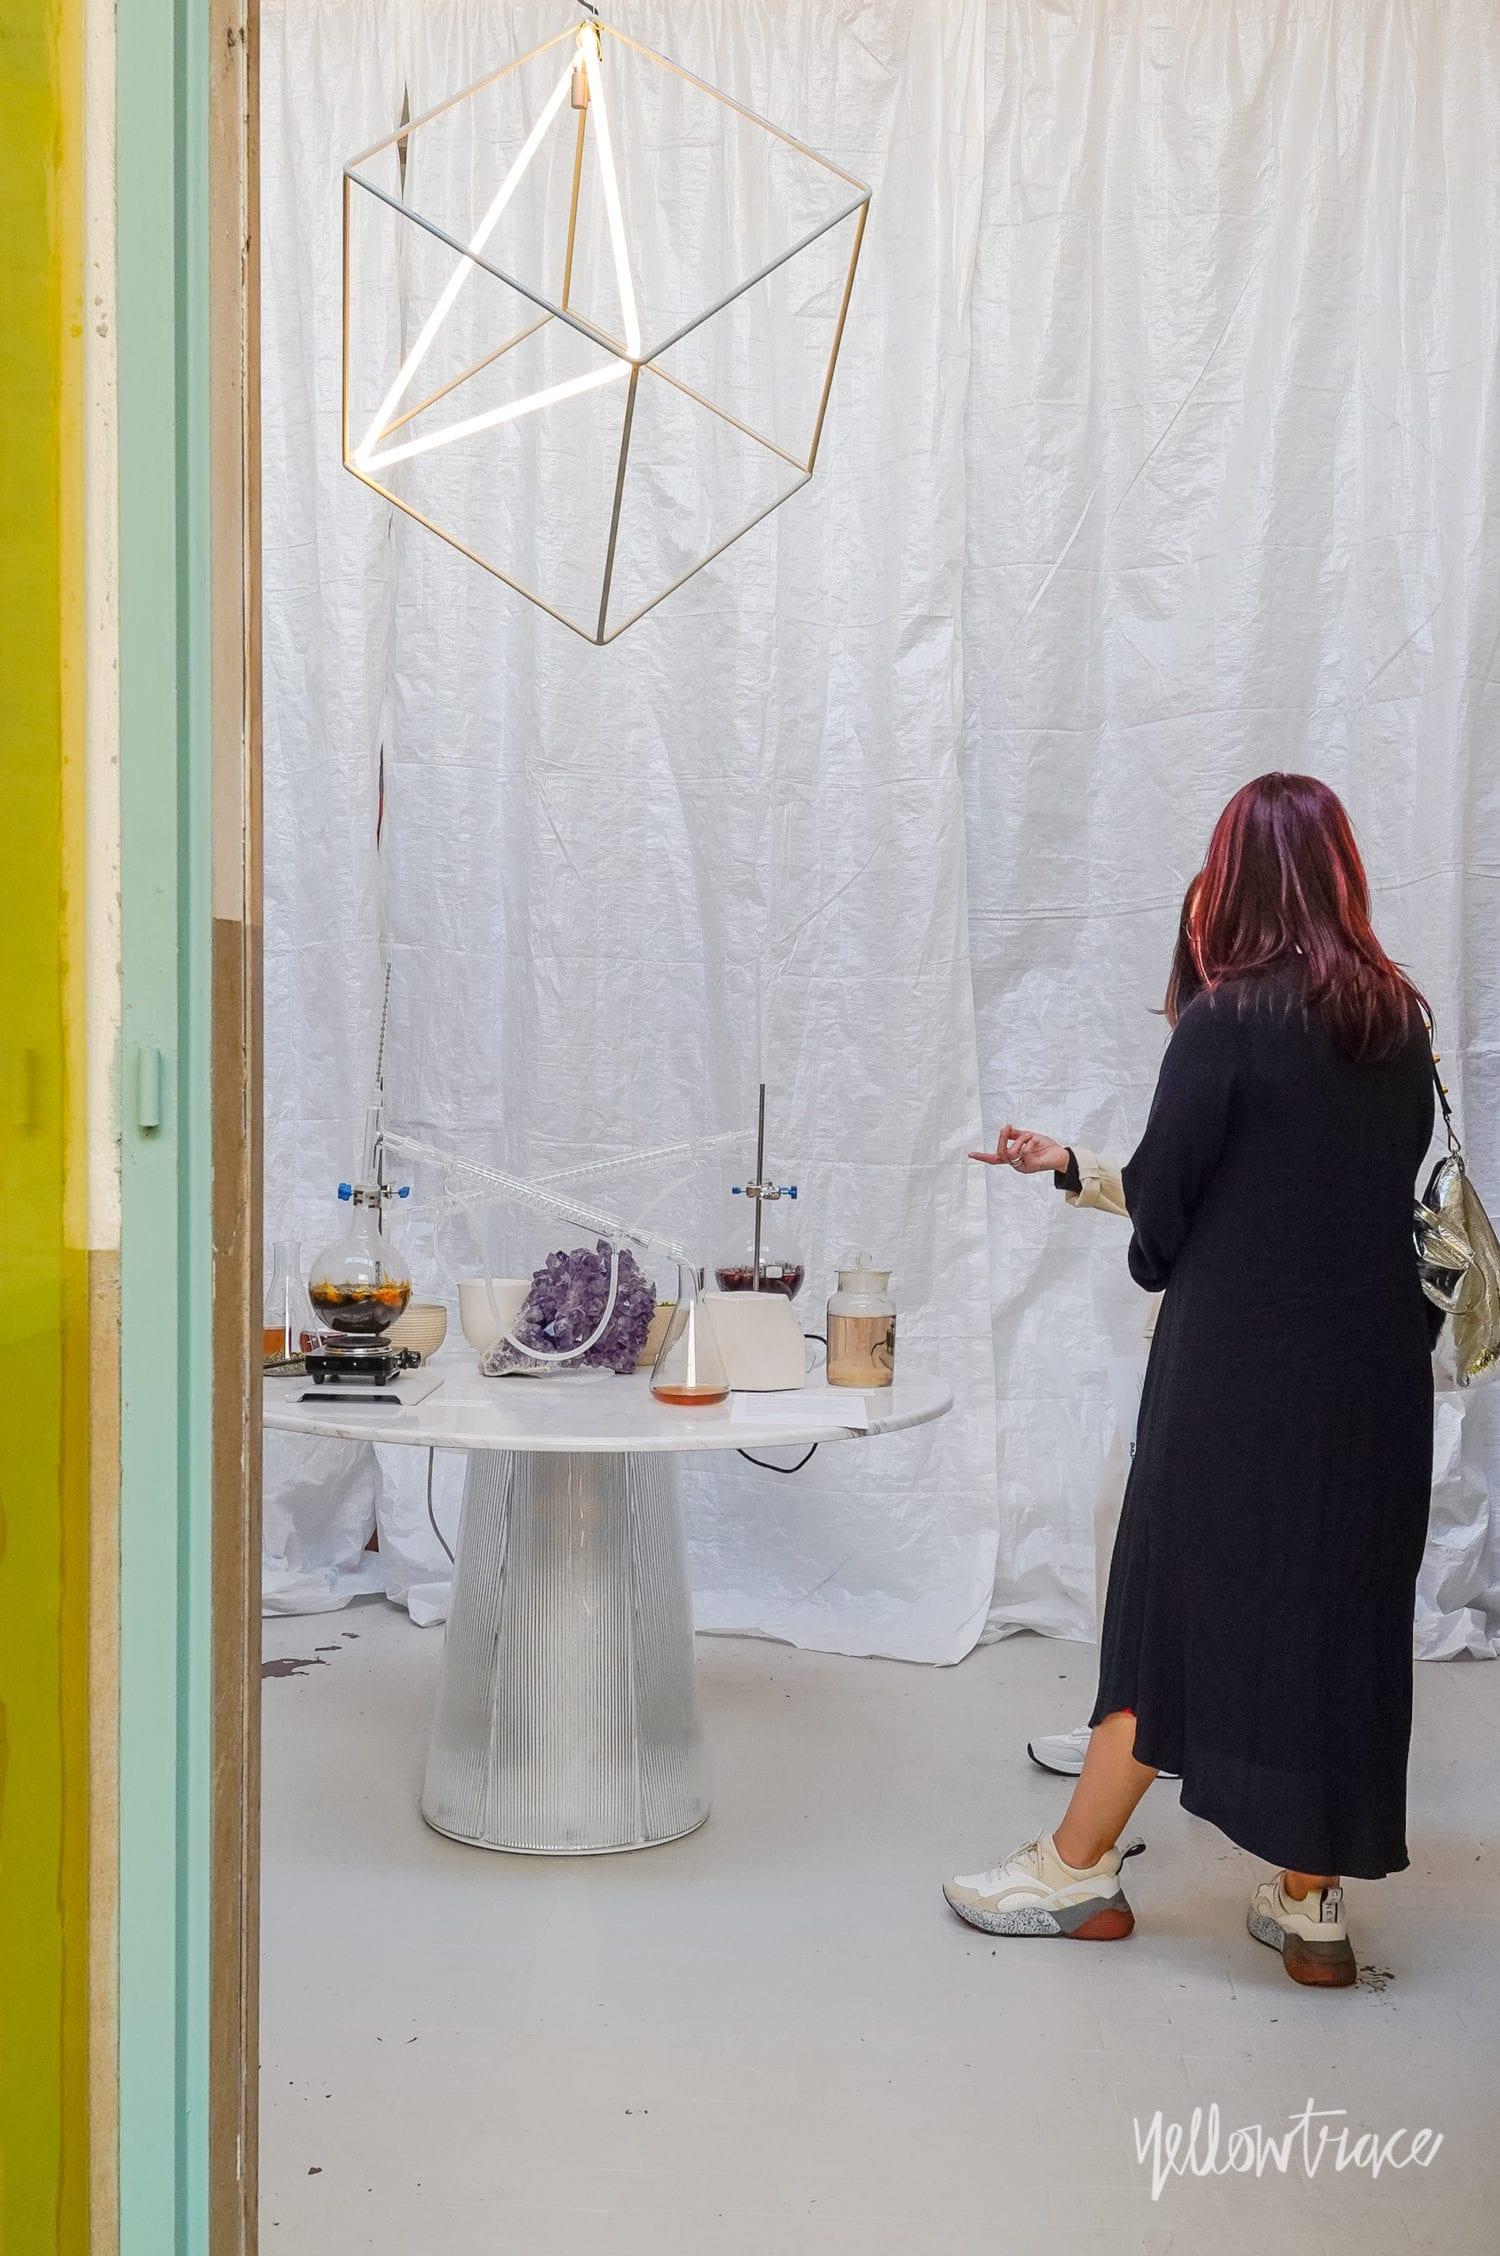 Les Arcanistes Studiopepe At Milan Design Week 2019 Photo Nick Hughes Yellowtrace 37a